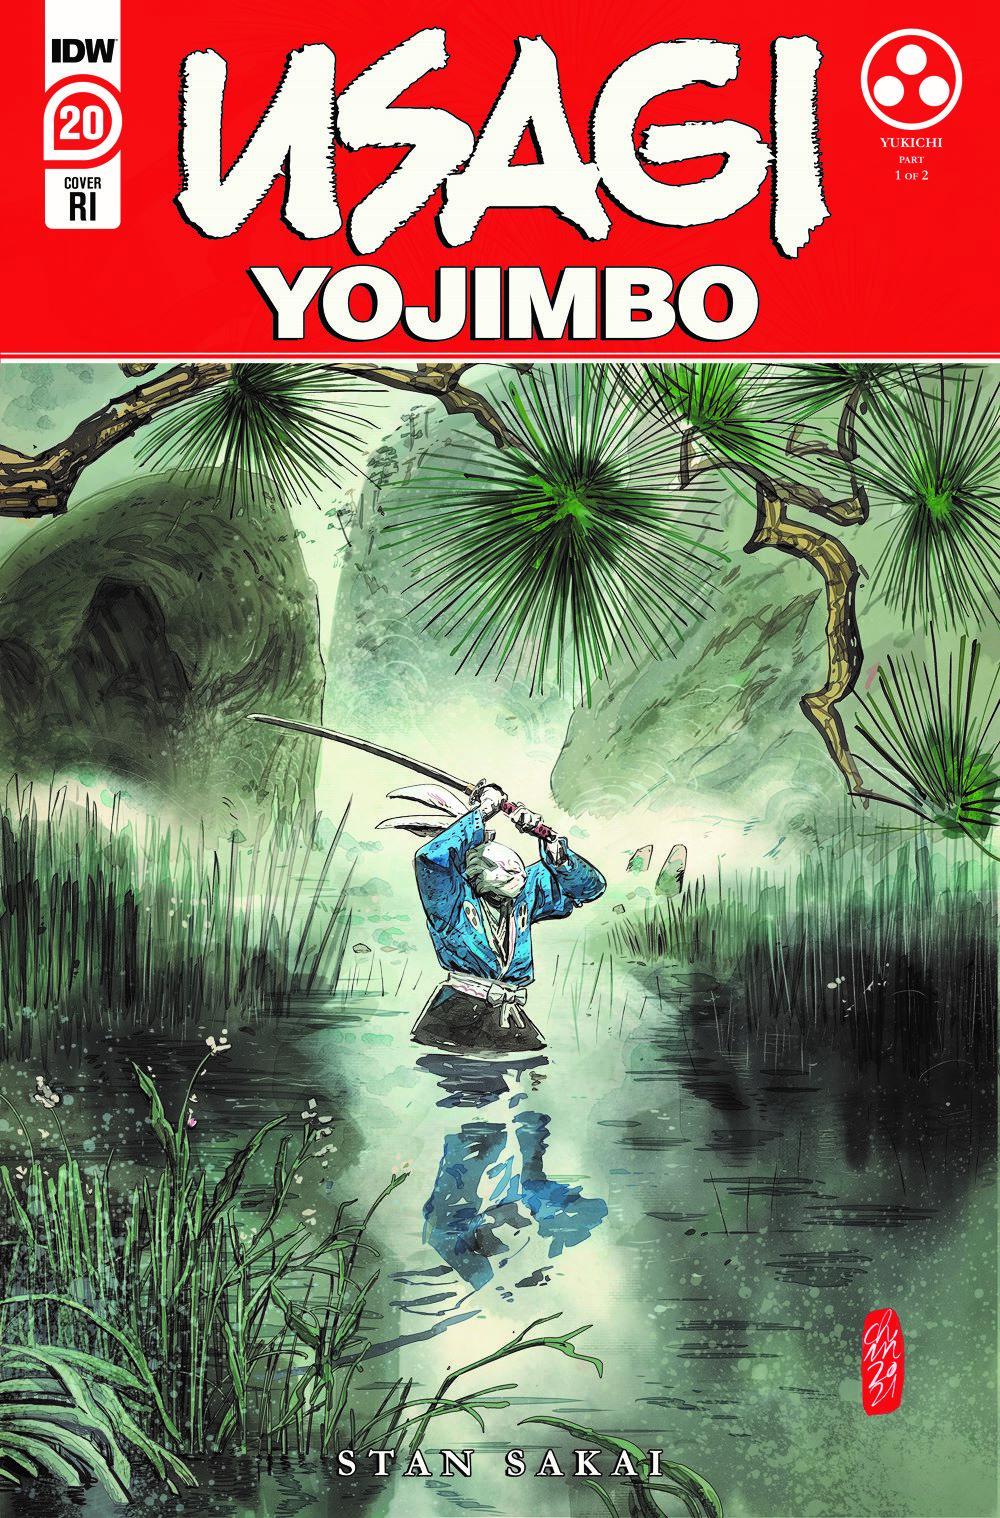 Usagi20_cvrRI ComicList Previews: USAGI YOJIMBO #20